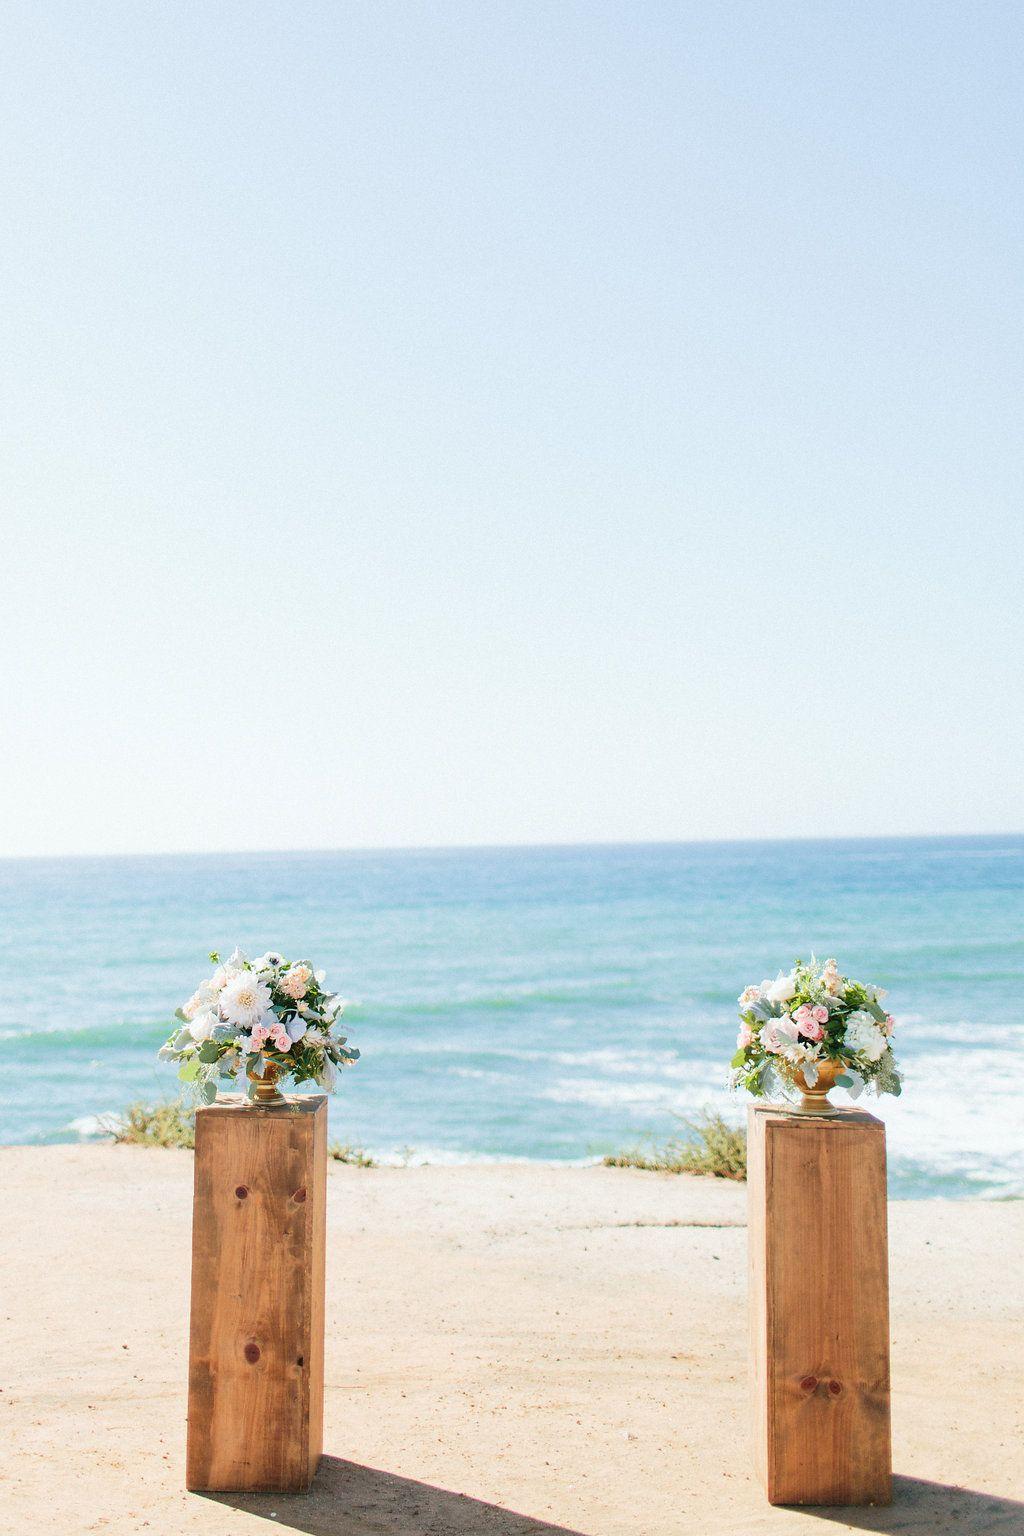 Bali wedding venues on the beach  Beach wedding ceremony  La Jolla Weddings  Compass Floral Design